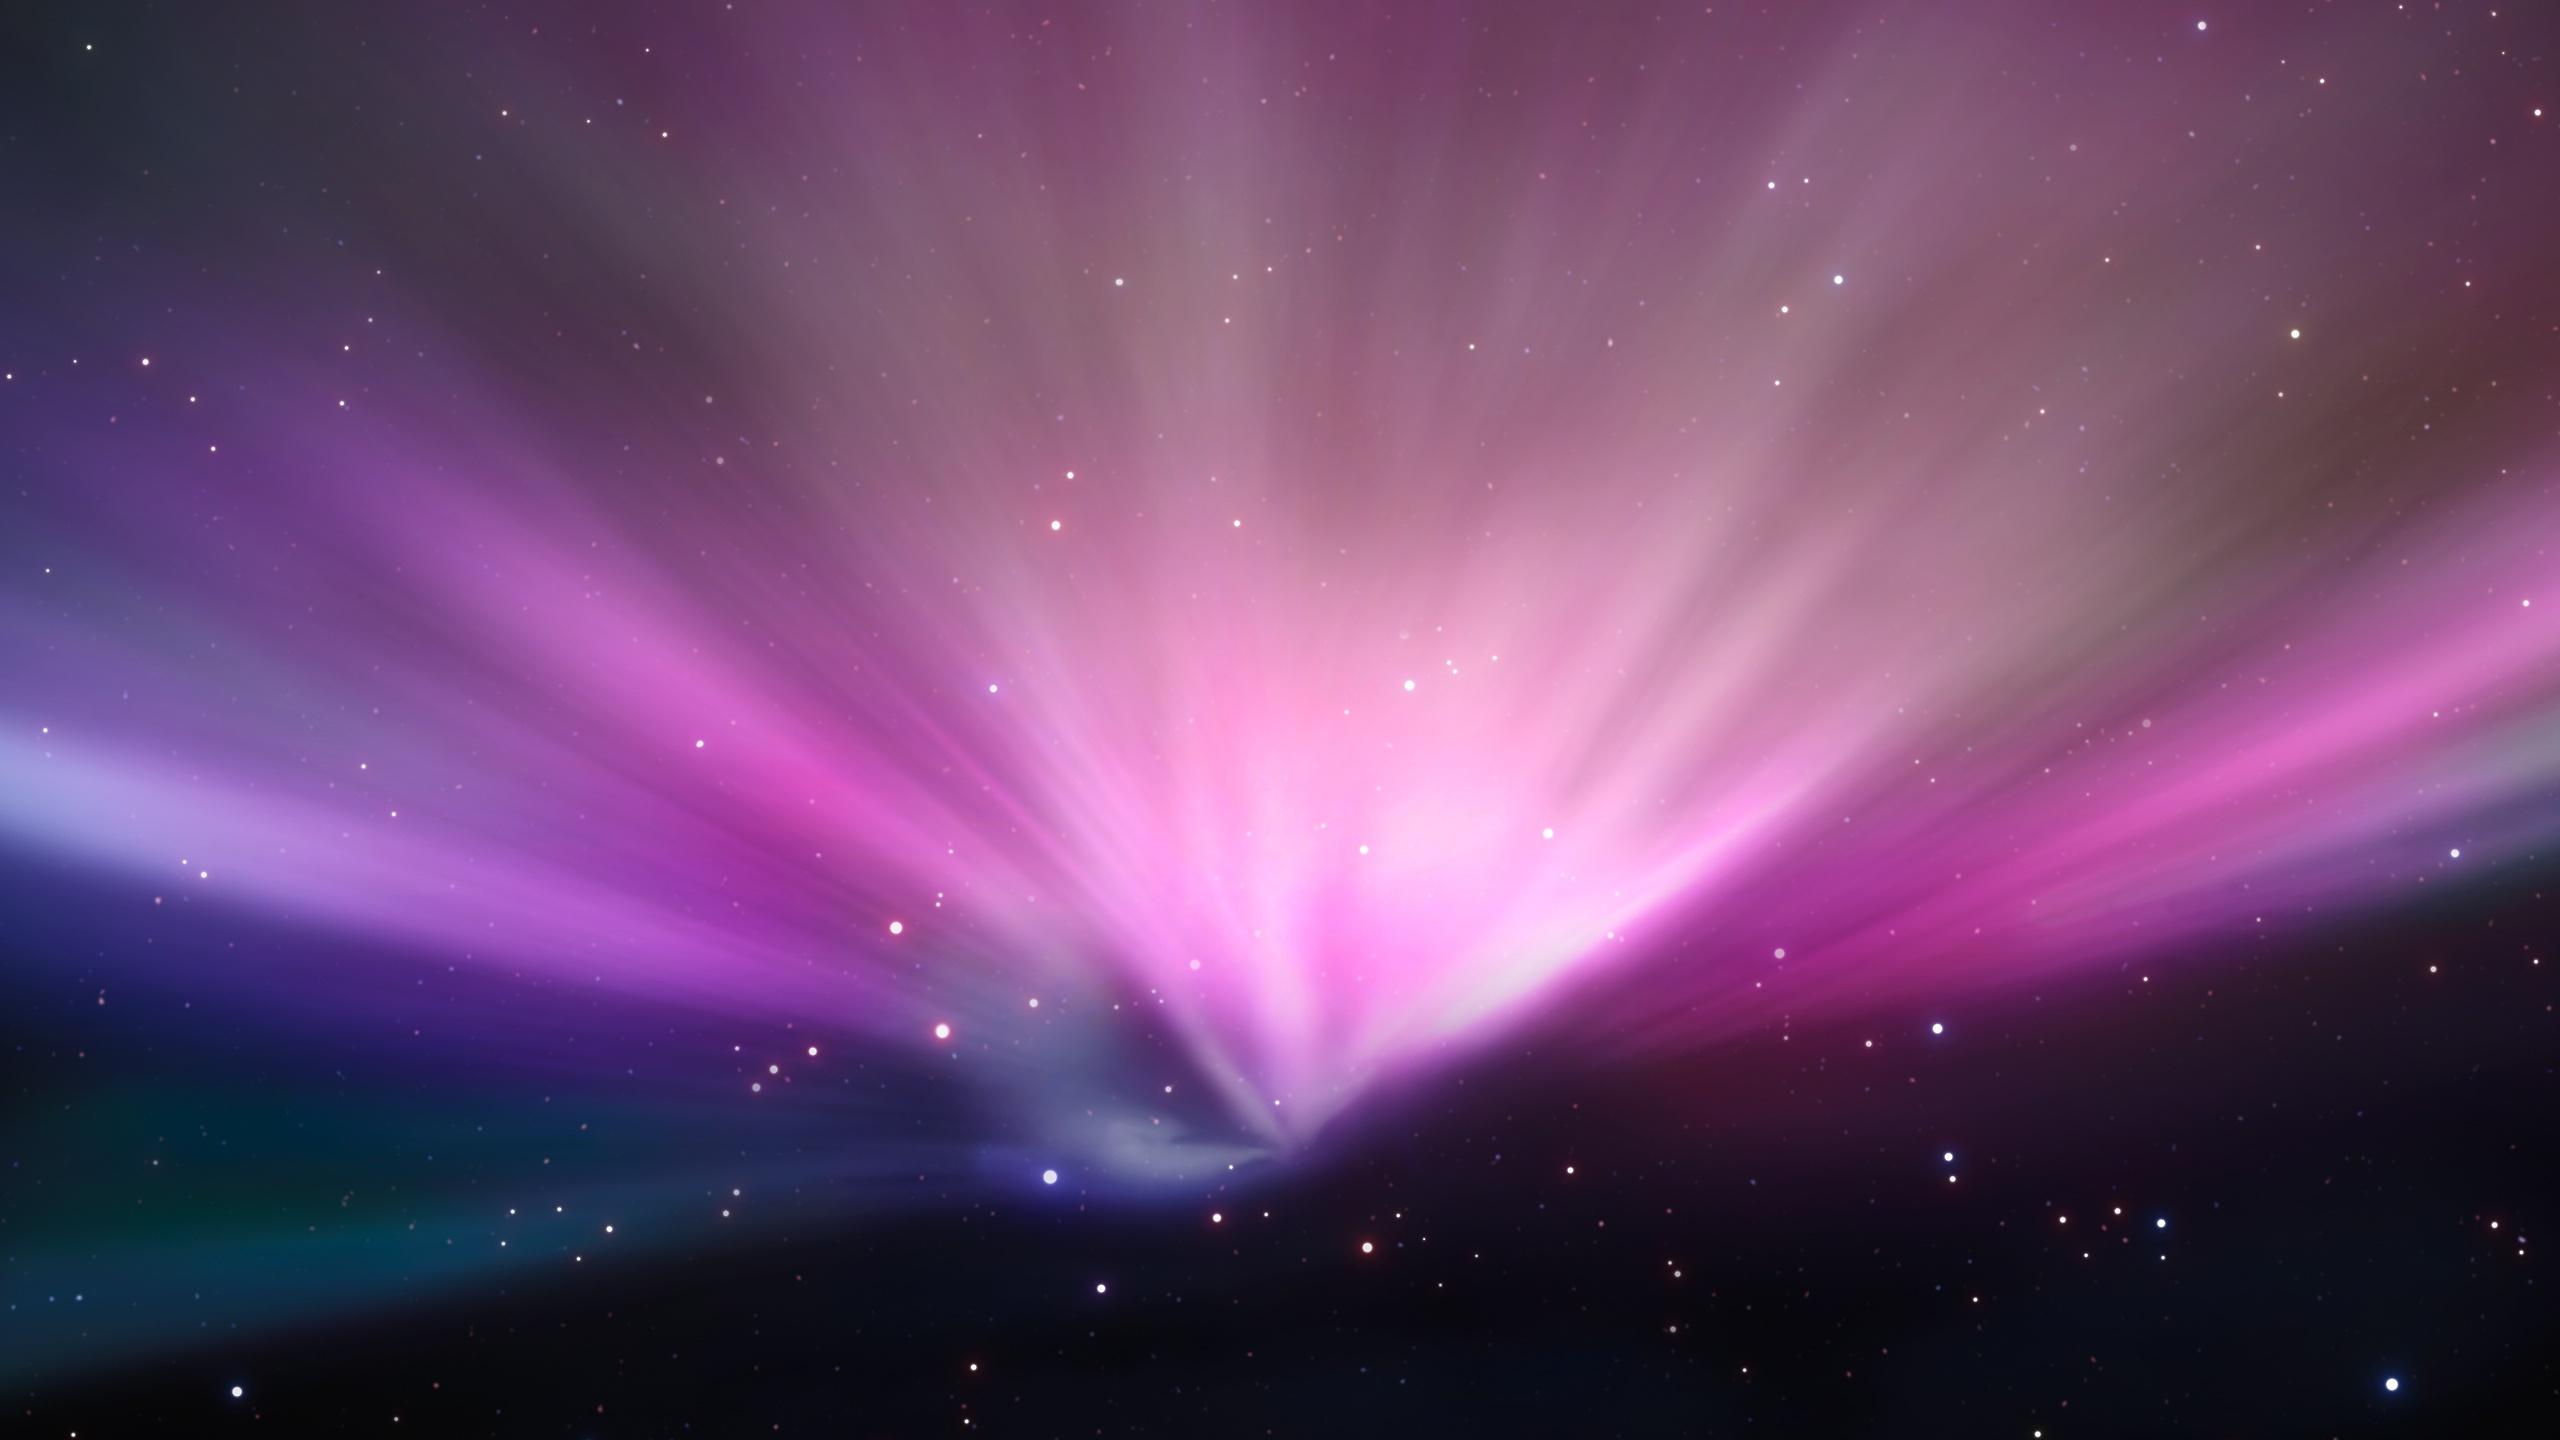 2560x1440 Wallpaper Space 2560x1440 Aurora in Space